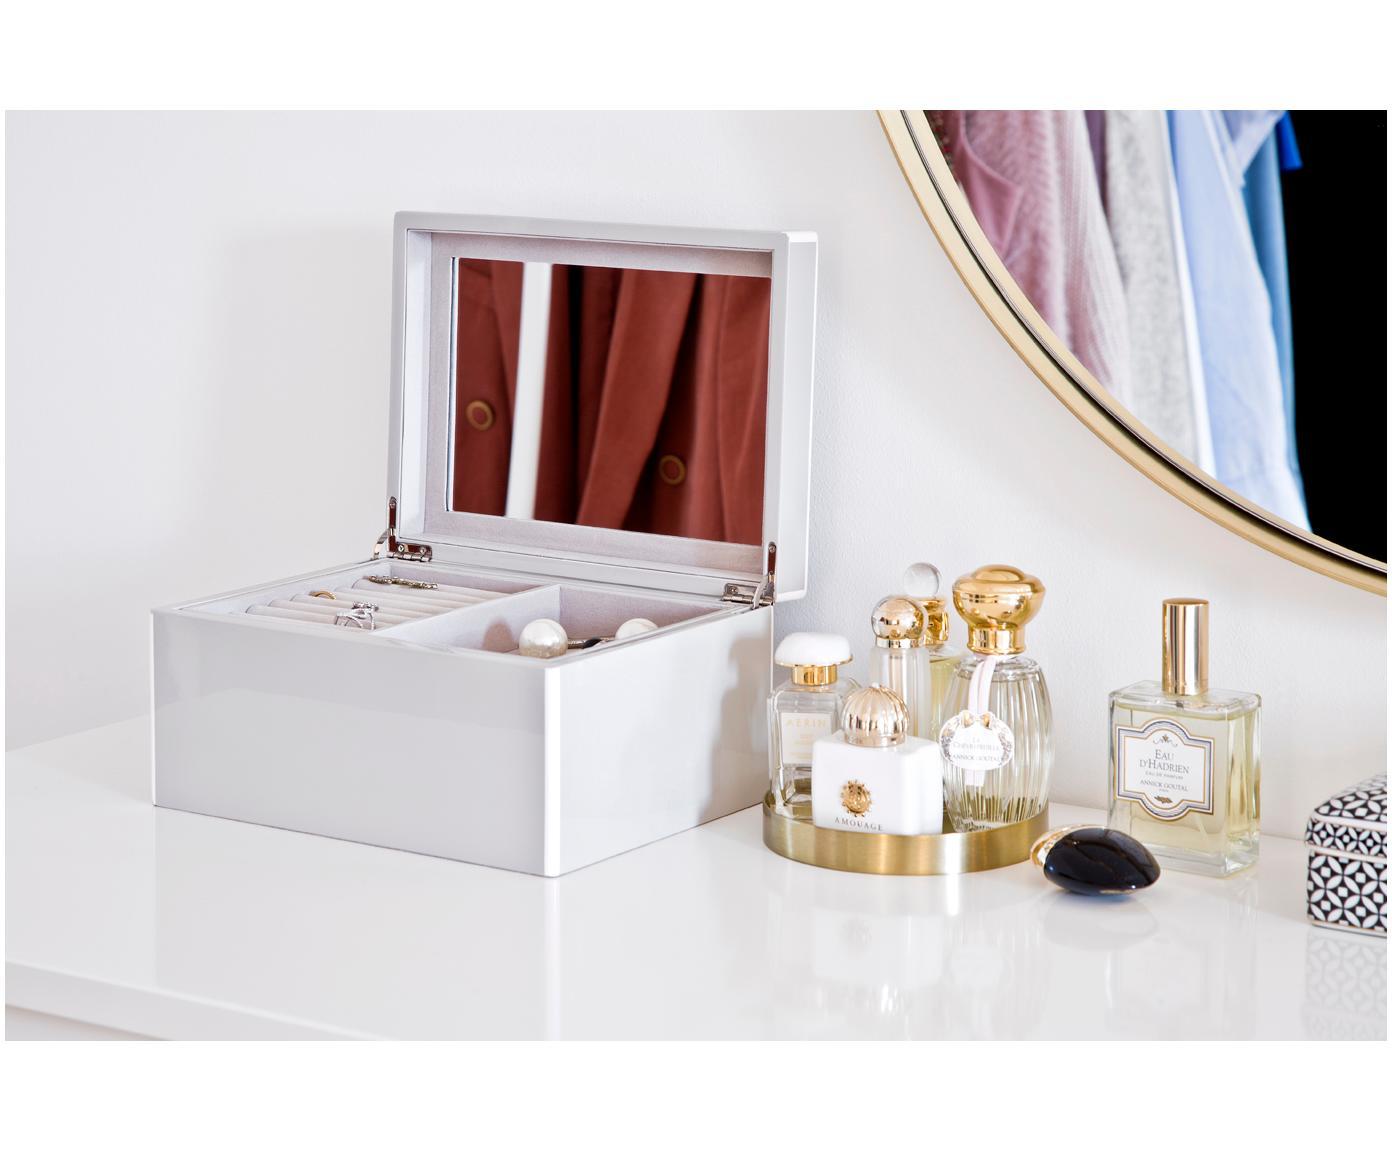 Sieradendoos Taylor met spiegel, Grijs, 26 x 13 cm